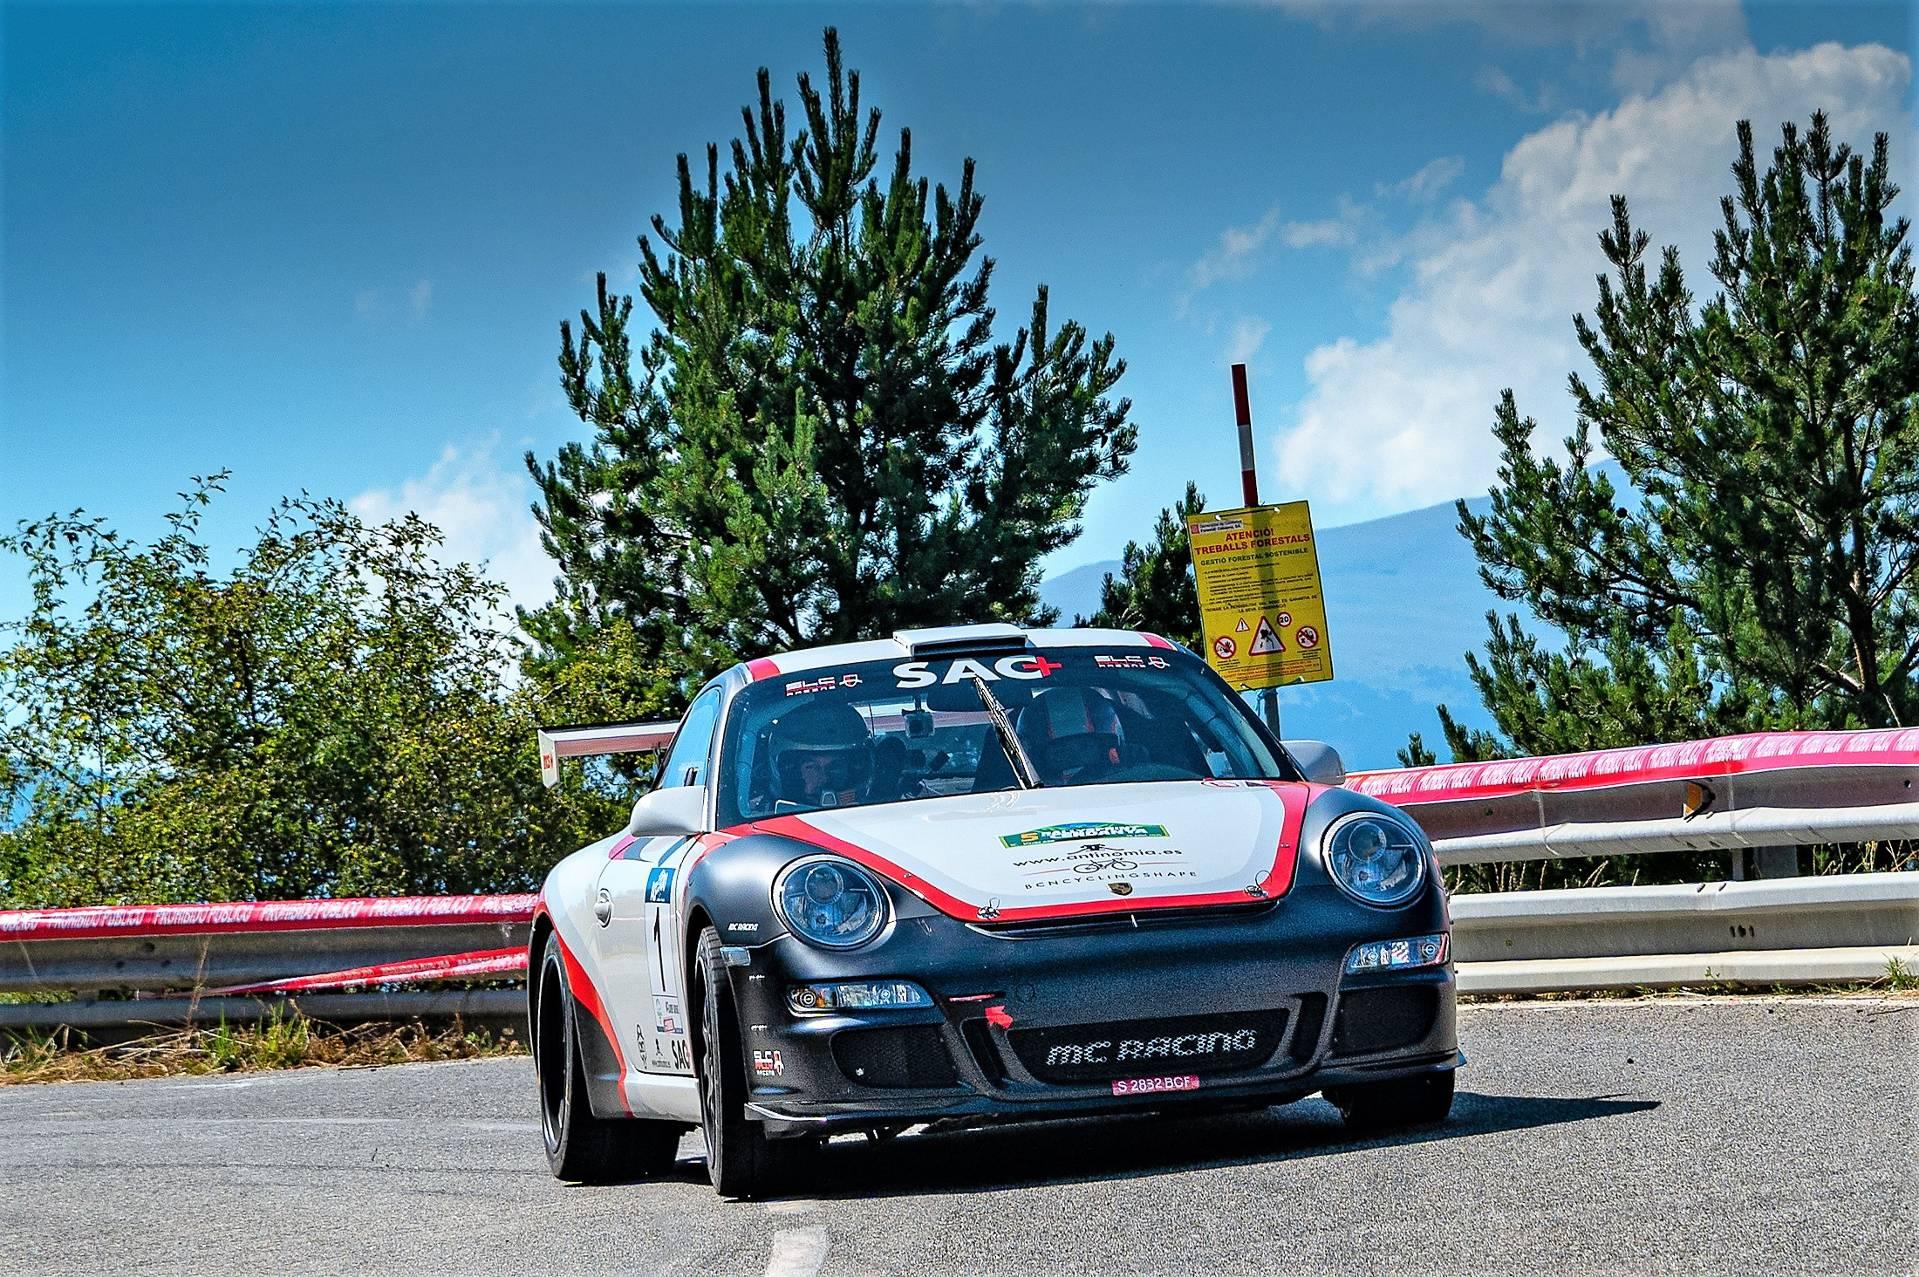 Domènech-Muntadas (Porsche) s'emporten el 5è Ral·lisprint de la Cerdanya